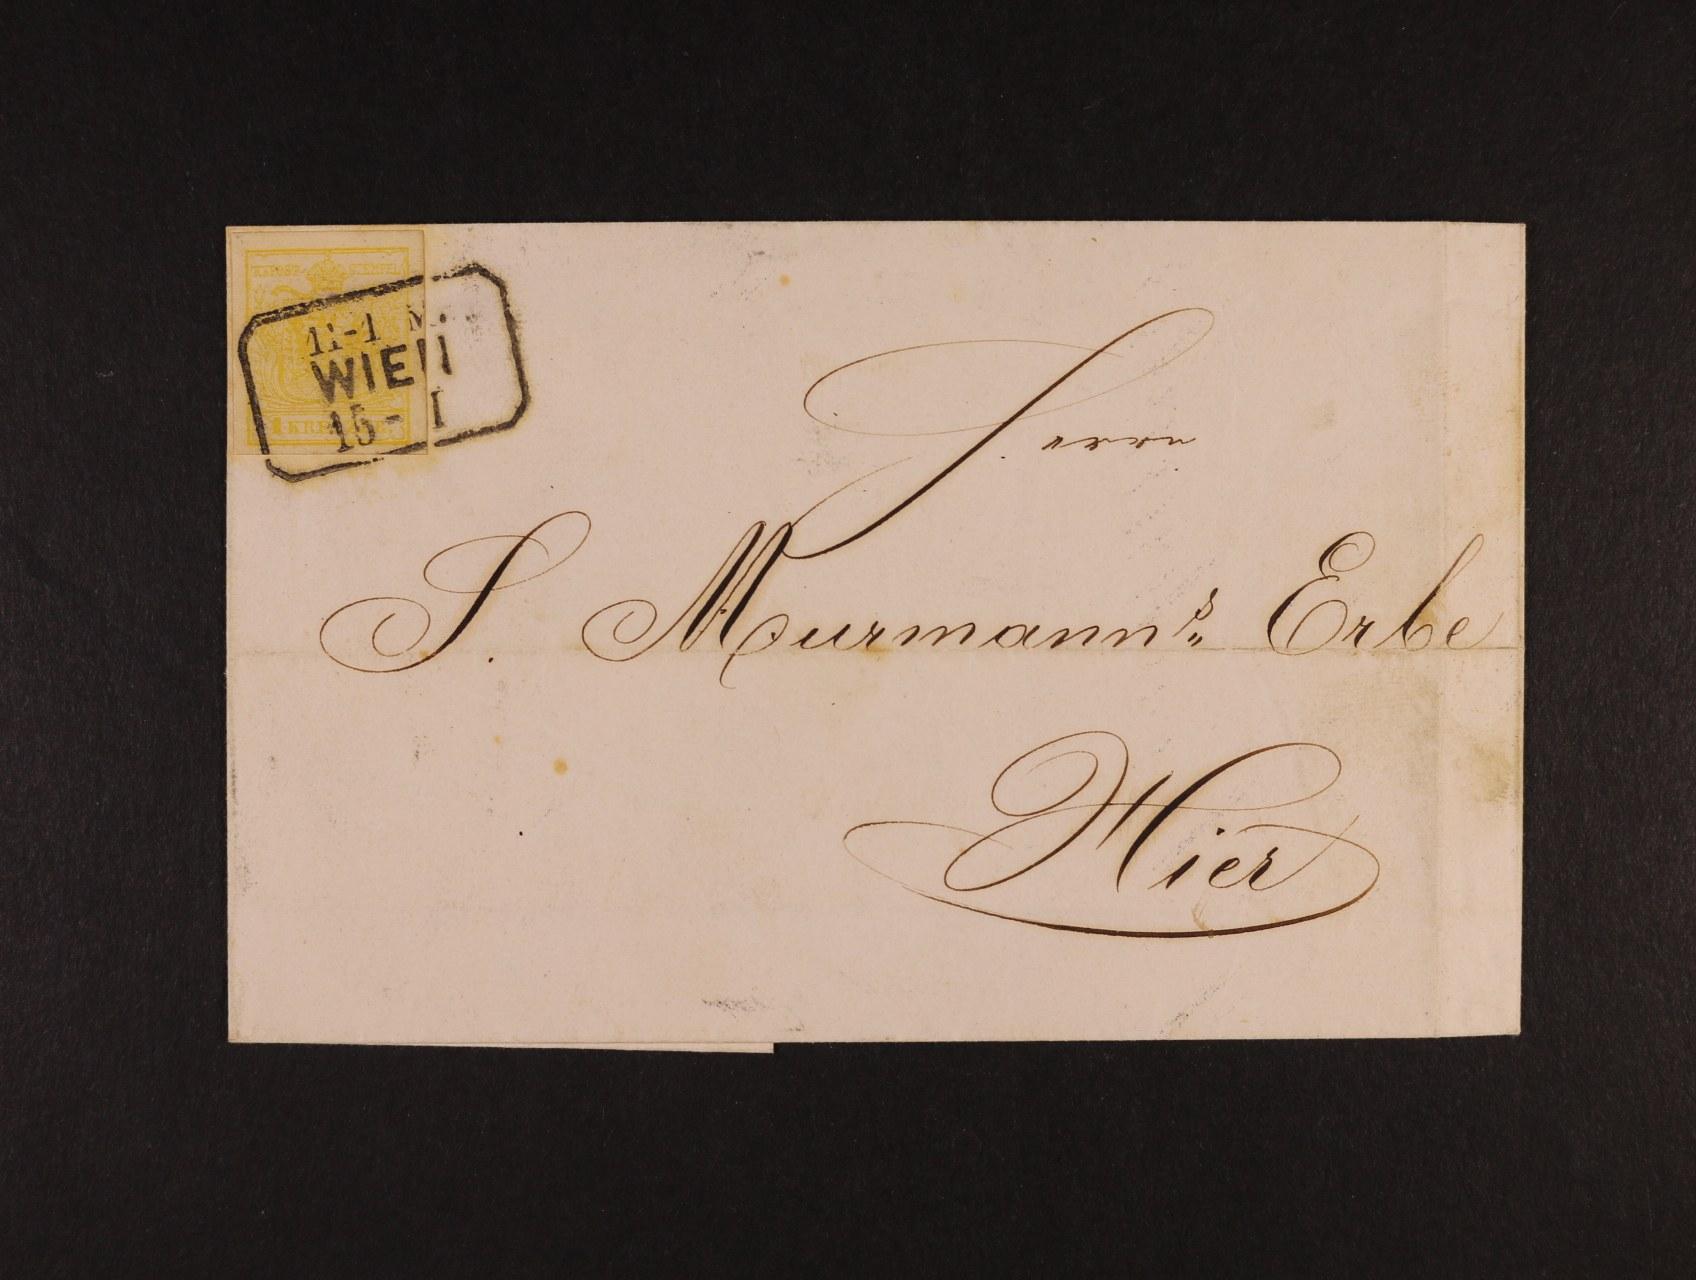 skl. dopis zr. 1857 frank. zn. Fe. č. 1, pod. rámeč. raz. WIEN